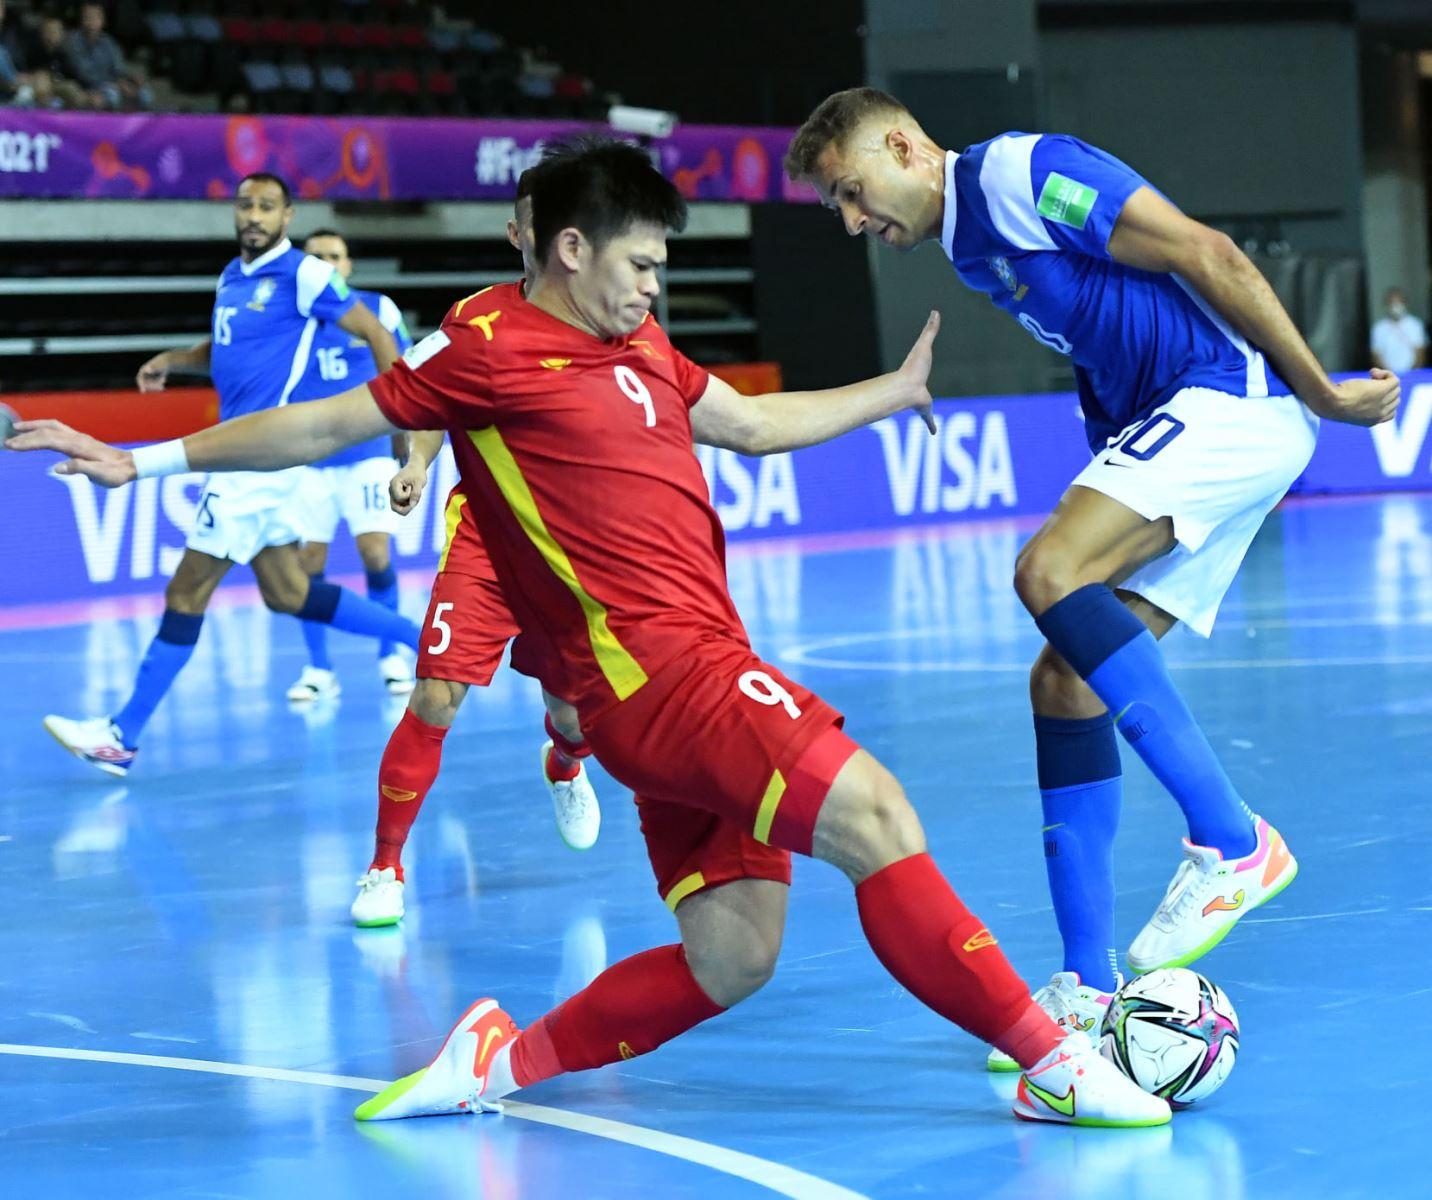 lịch thi đấu futsal World Cup 2021, VTV6 VTV5 trực tiếp futsal hôm nay, VTV6, VTV5, lịch thi đấu futsal Việt Nam, lịch thi đấu bóng đá futsal World Cup 2021